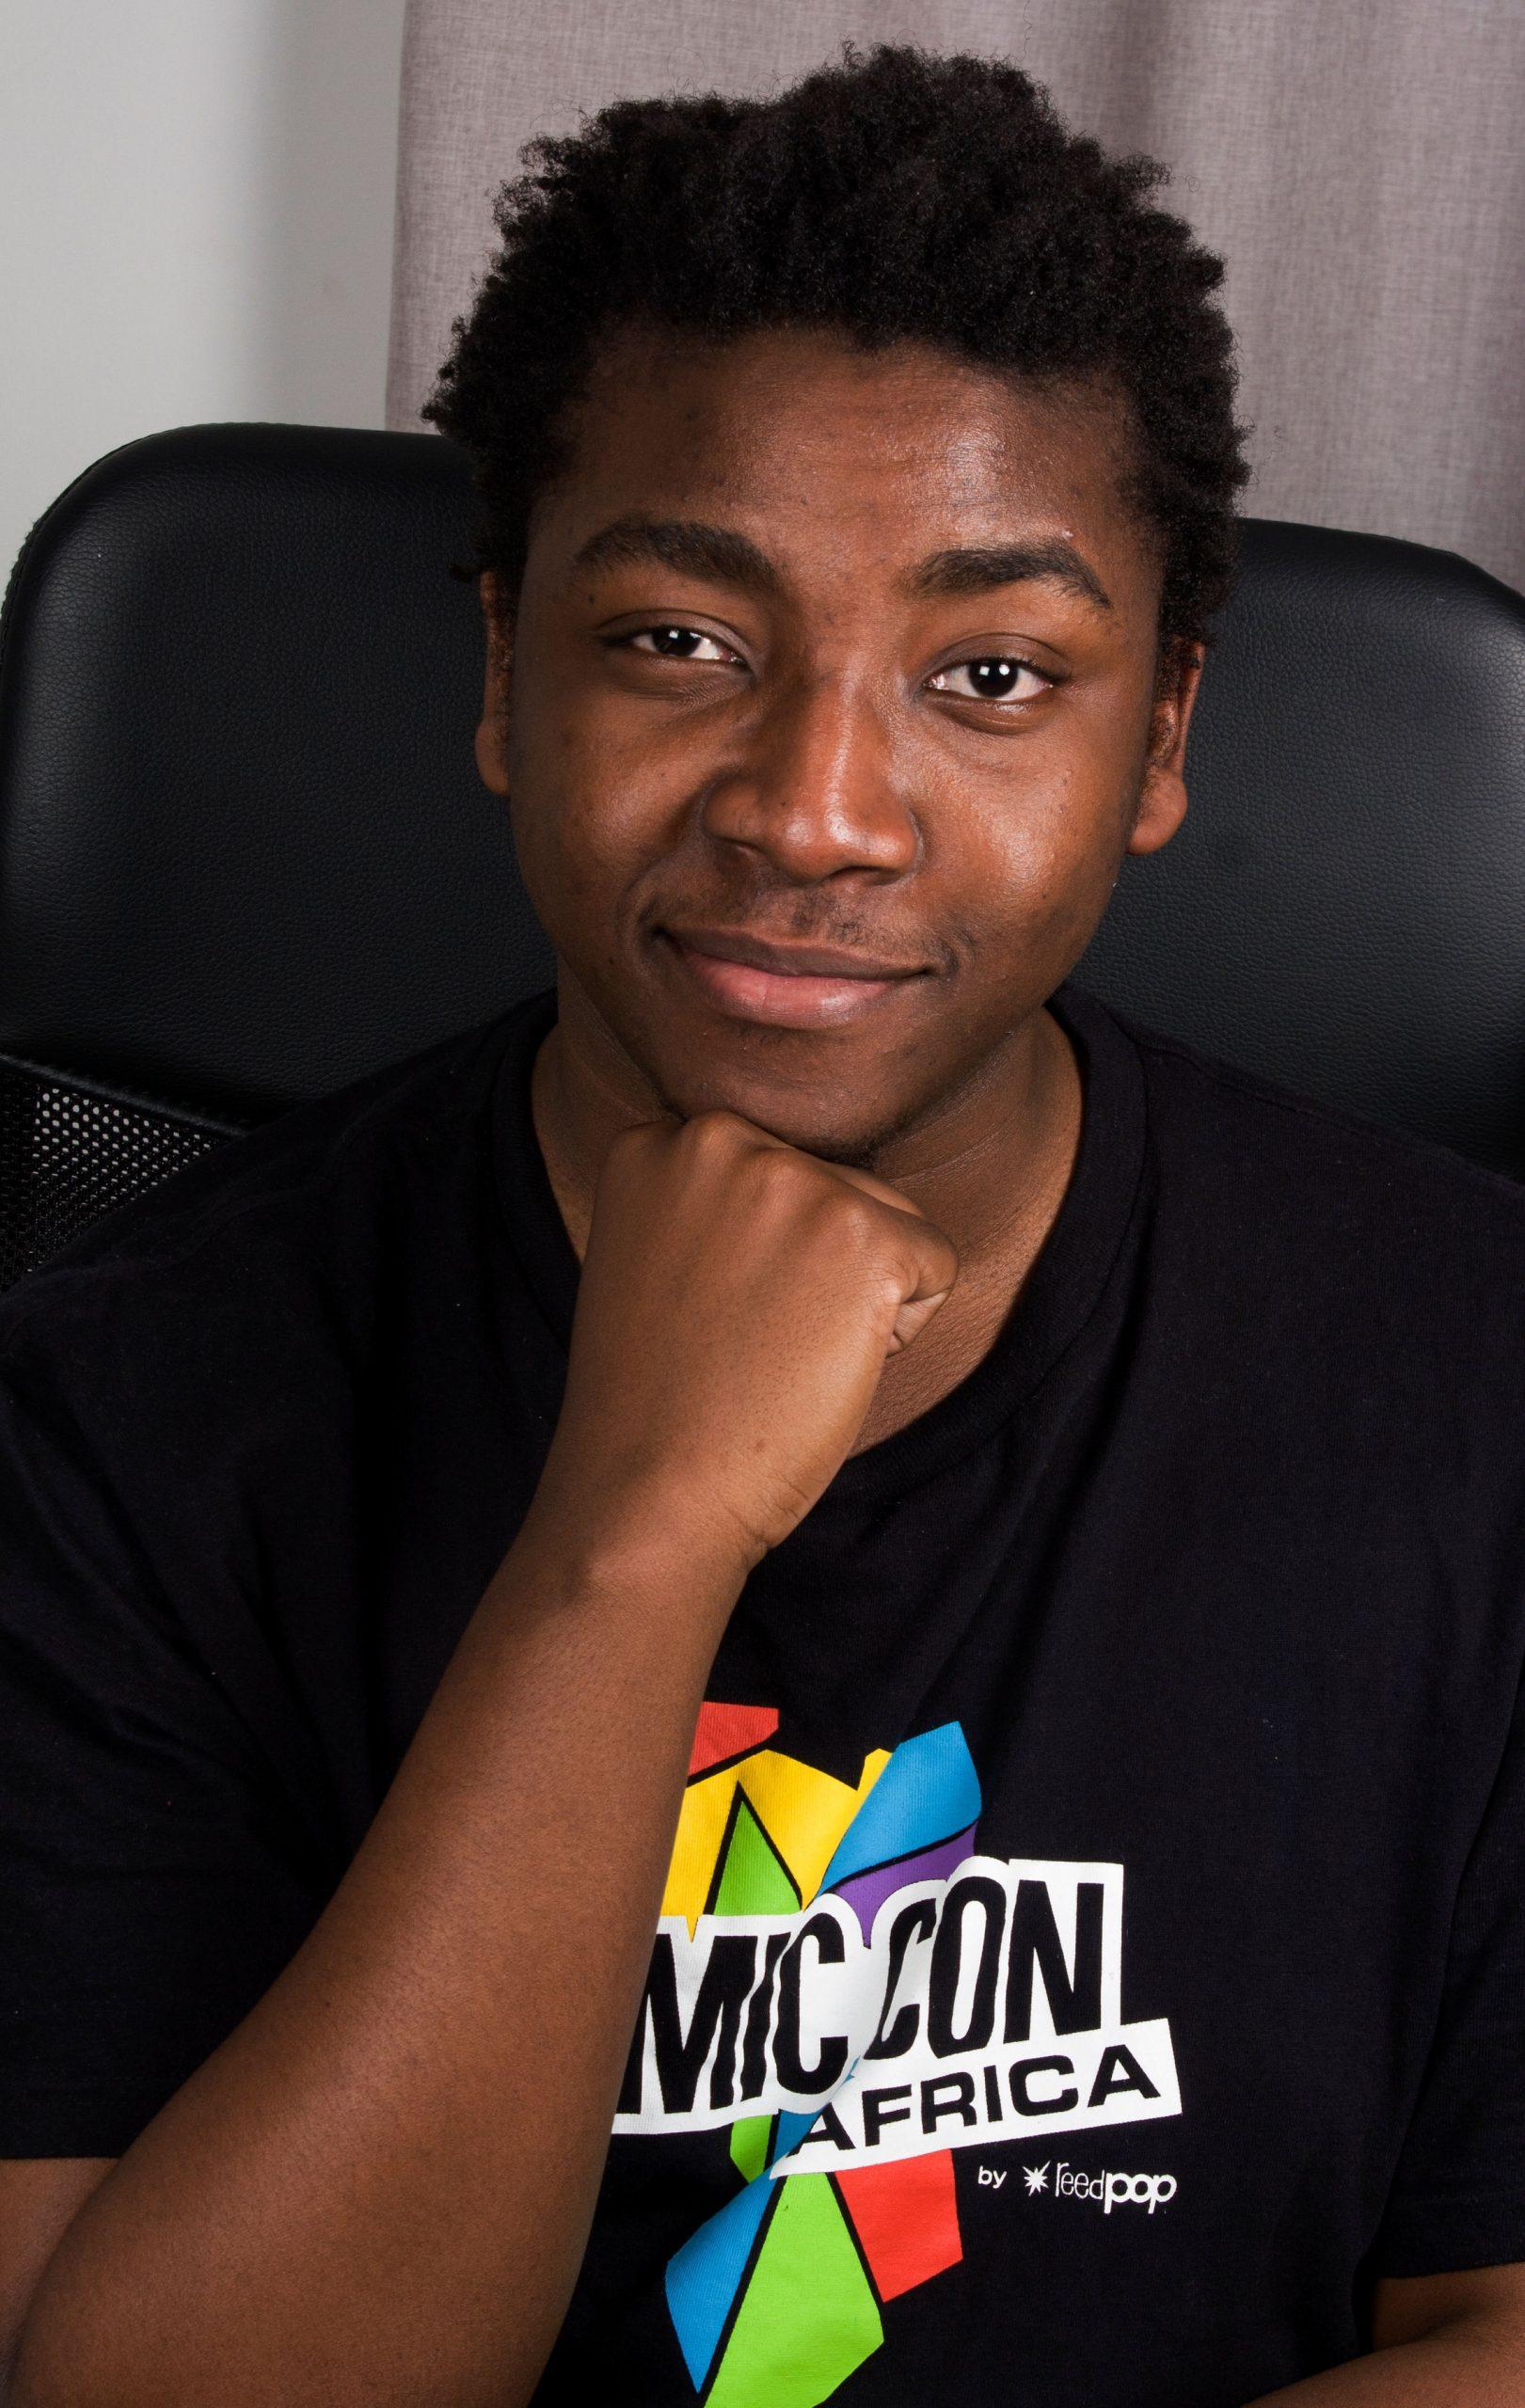 African Comic Books creator Bill Masuku